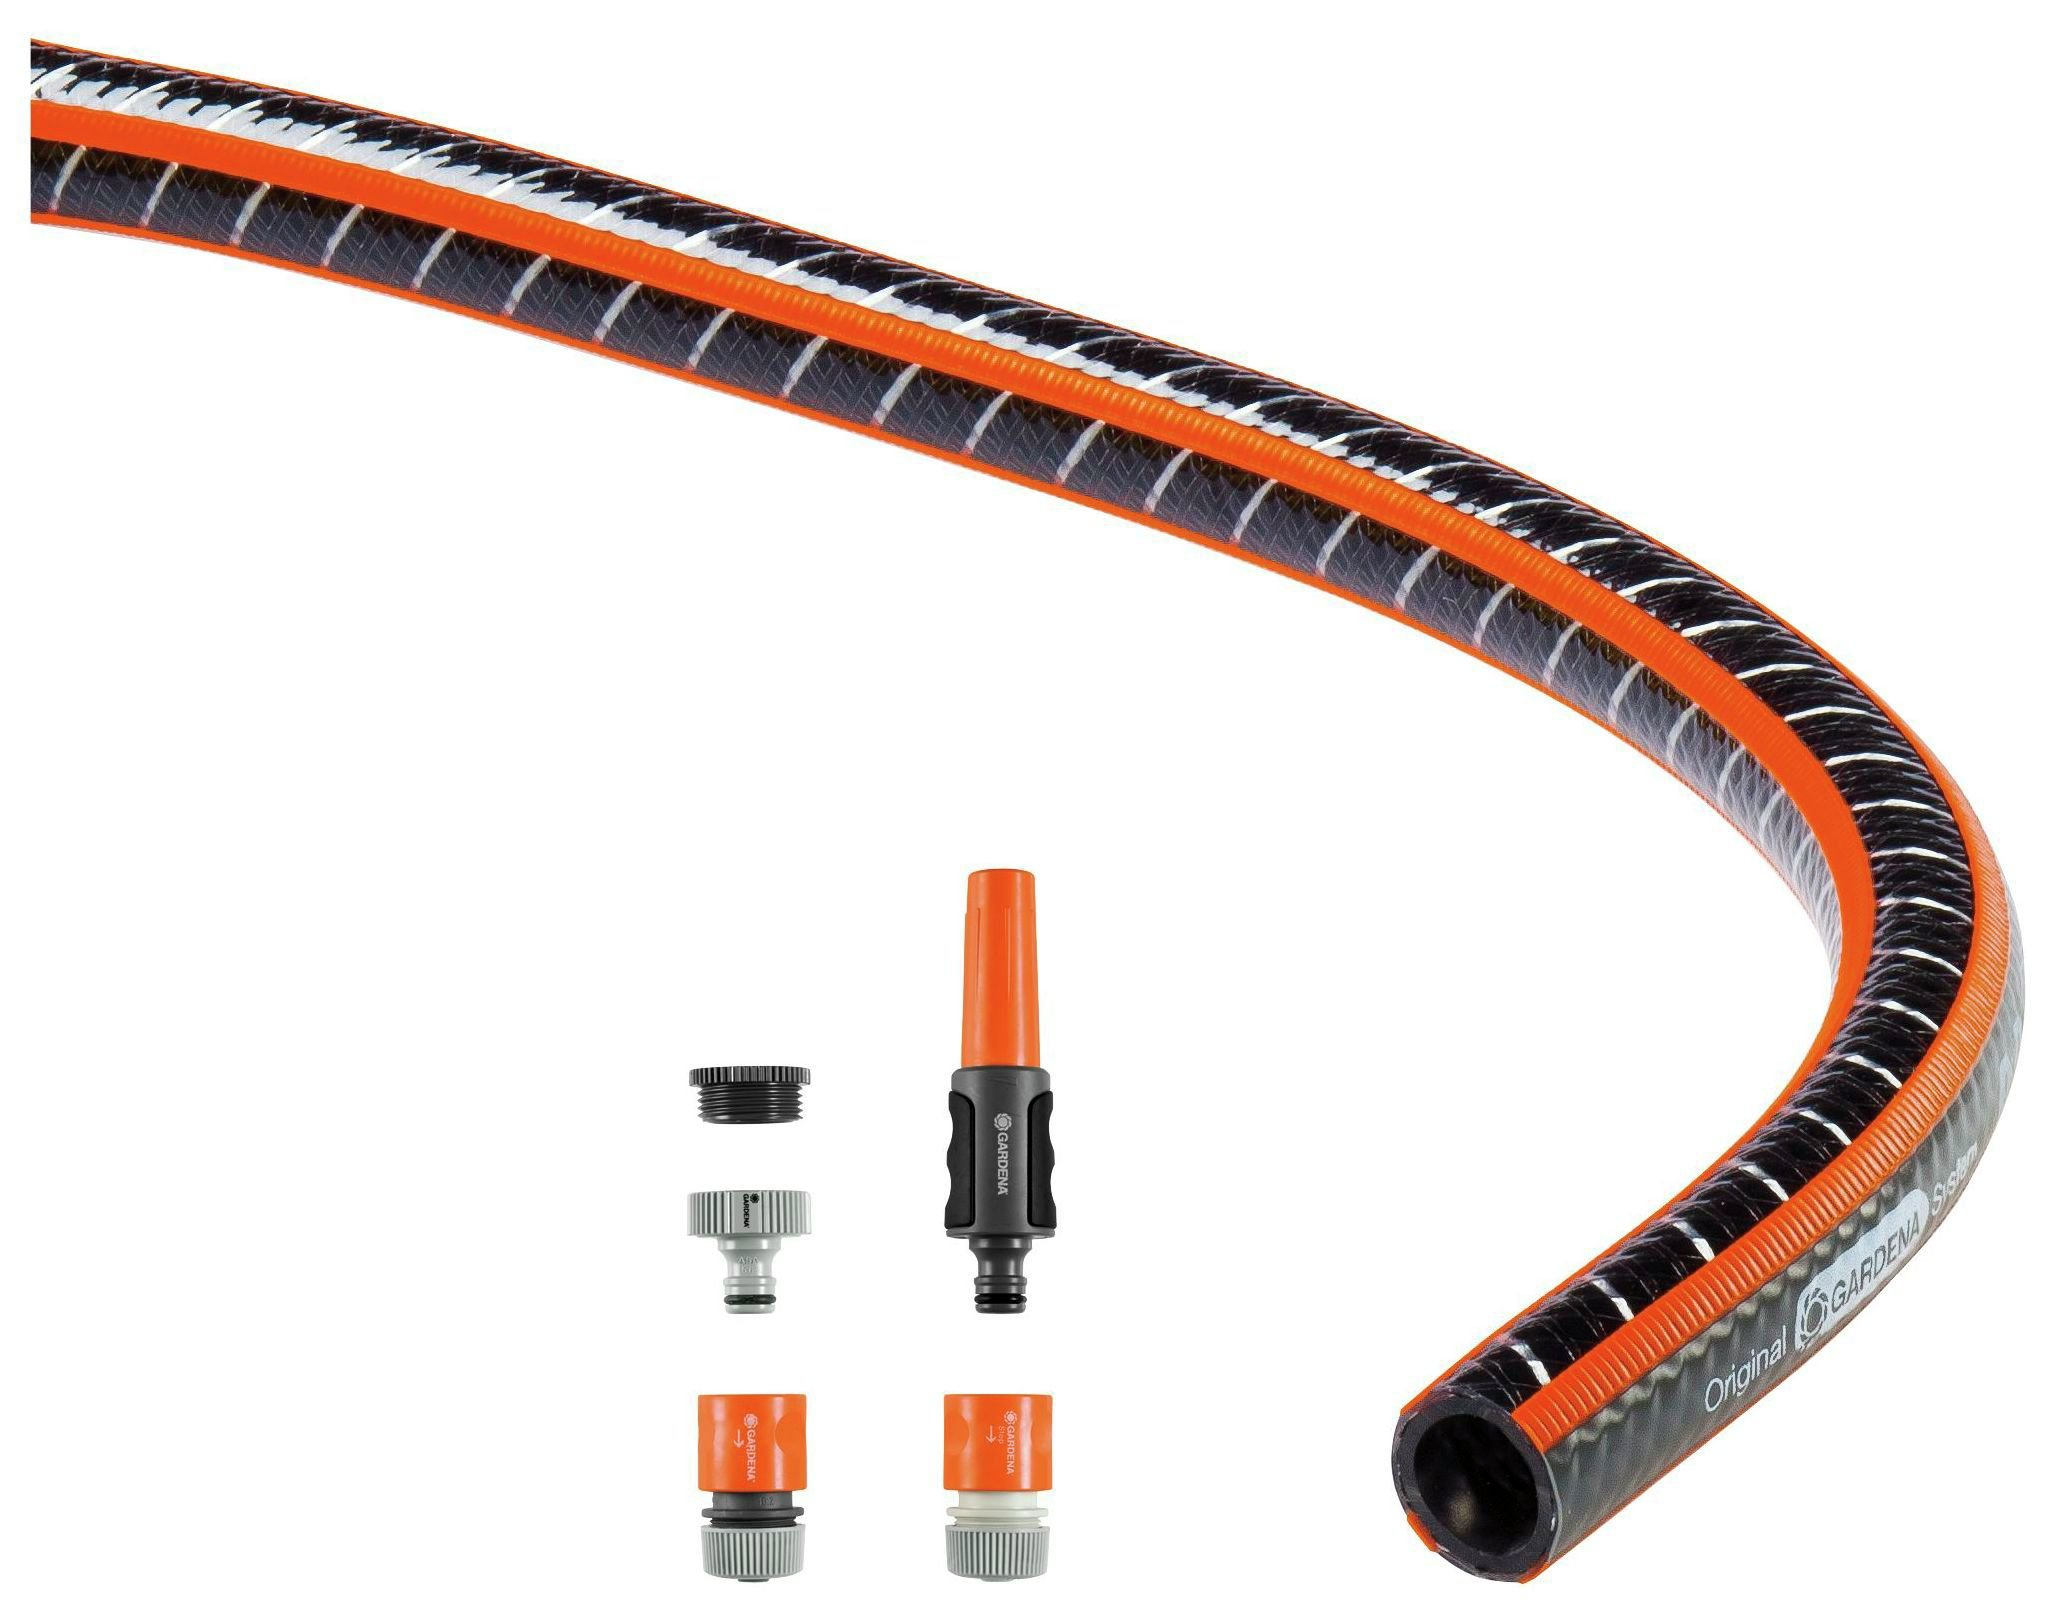 Image of Gardena Comfort Flex Hose and Connector Set 1803420 - 20m.